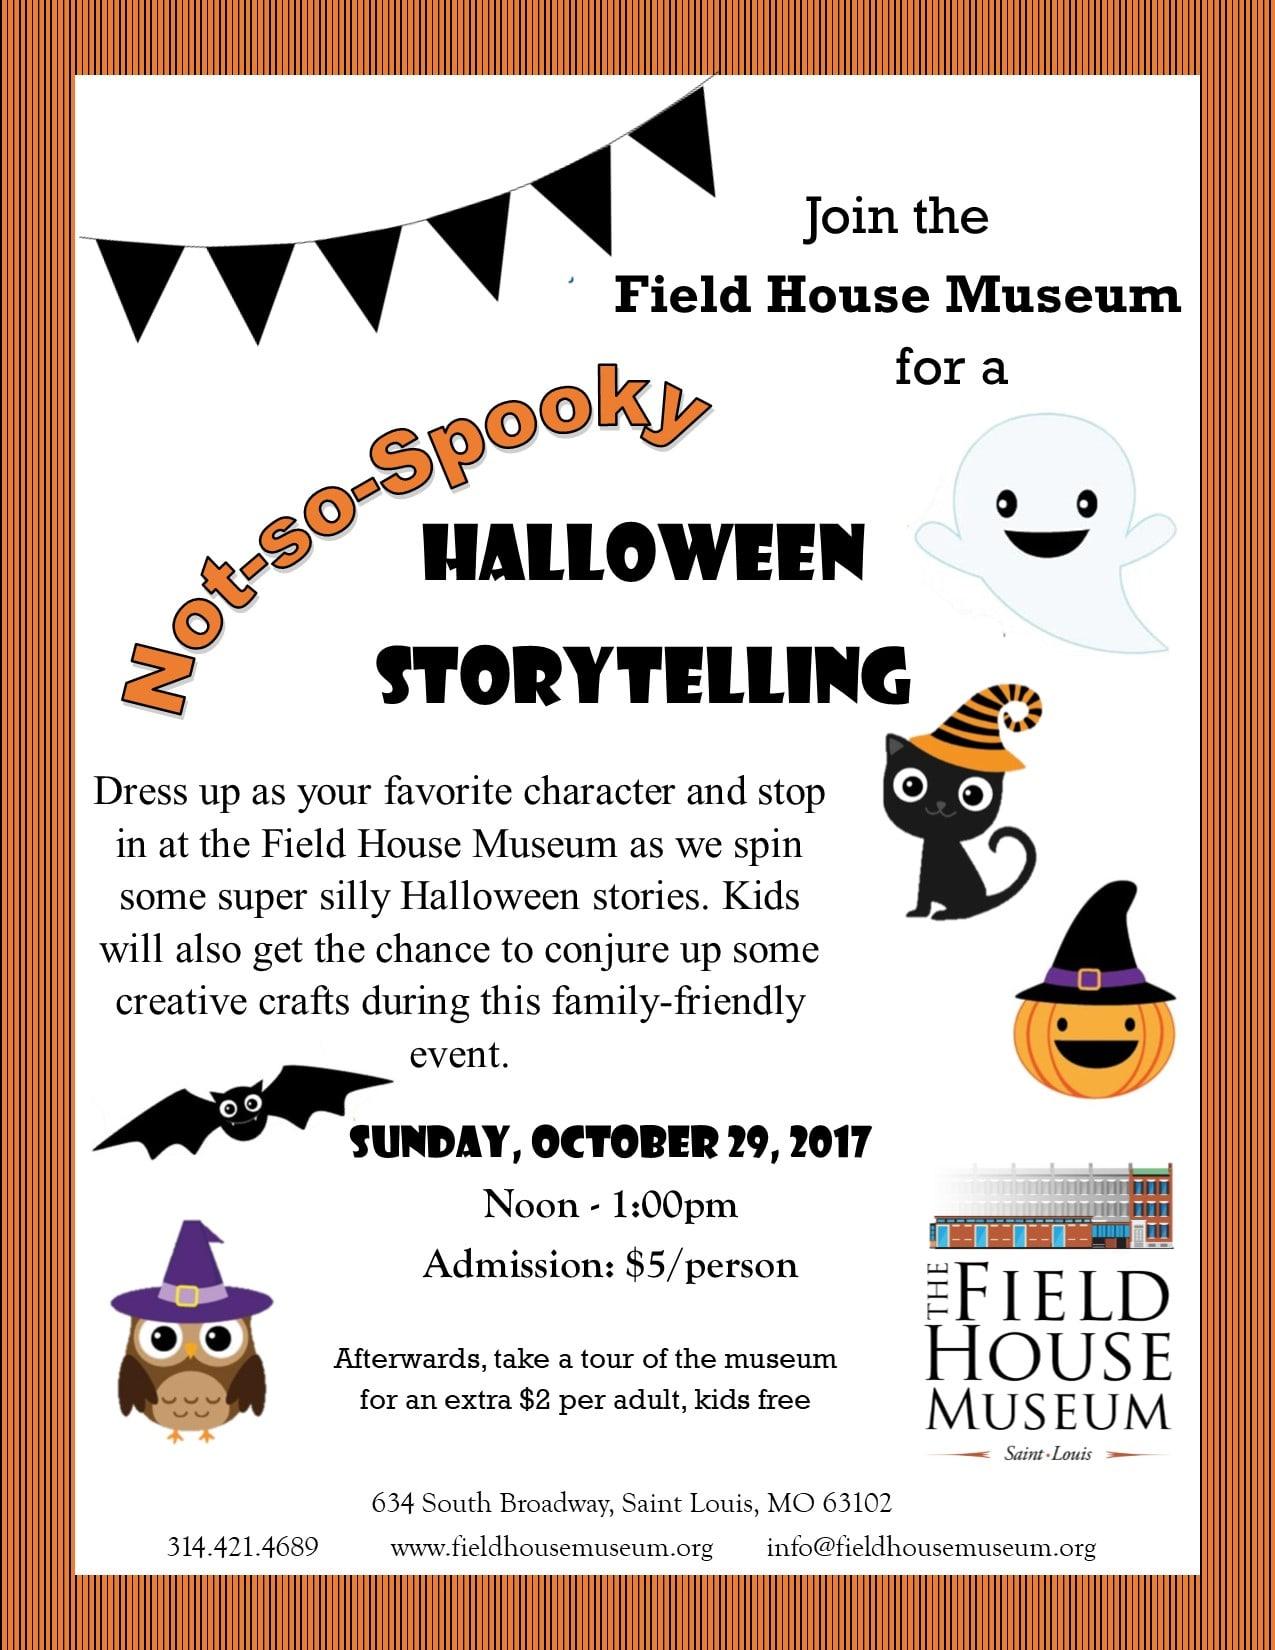 Not-So-Spooky Halloween Storytelling | Field House Museum